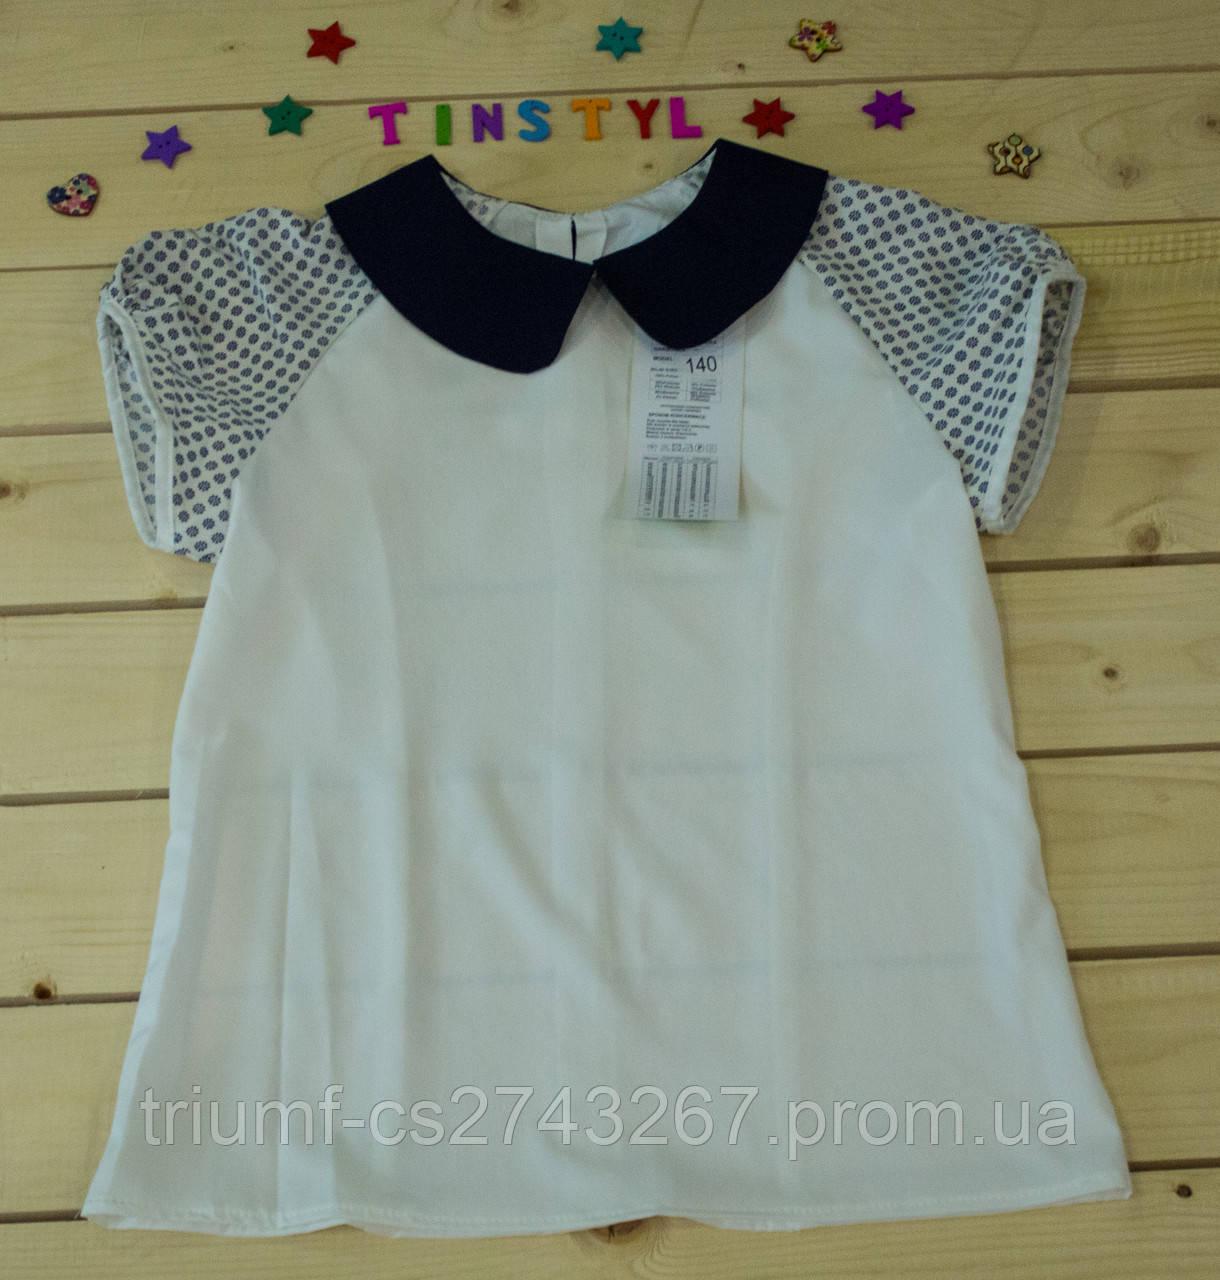 91622dd3b12 Нарядная блузка с коротким рукавом для девочки на рост 128-152 ...